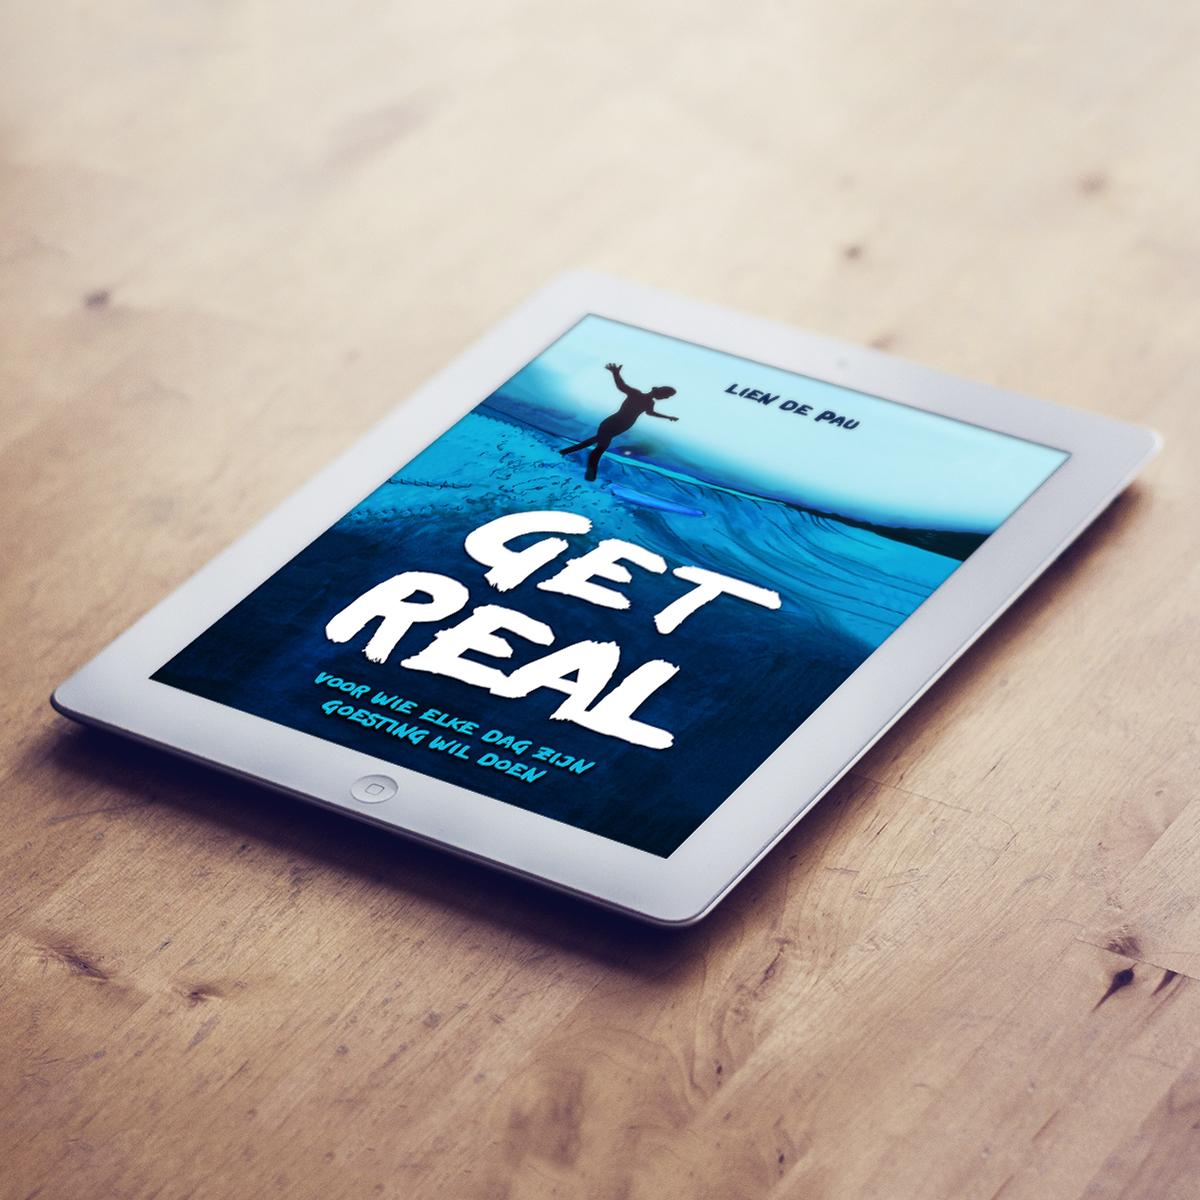 GetReal_LienDePau_NL_iPad_Hout_Square.jpg